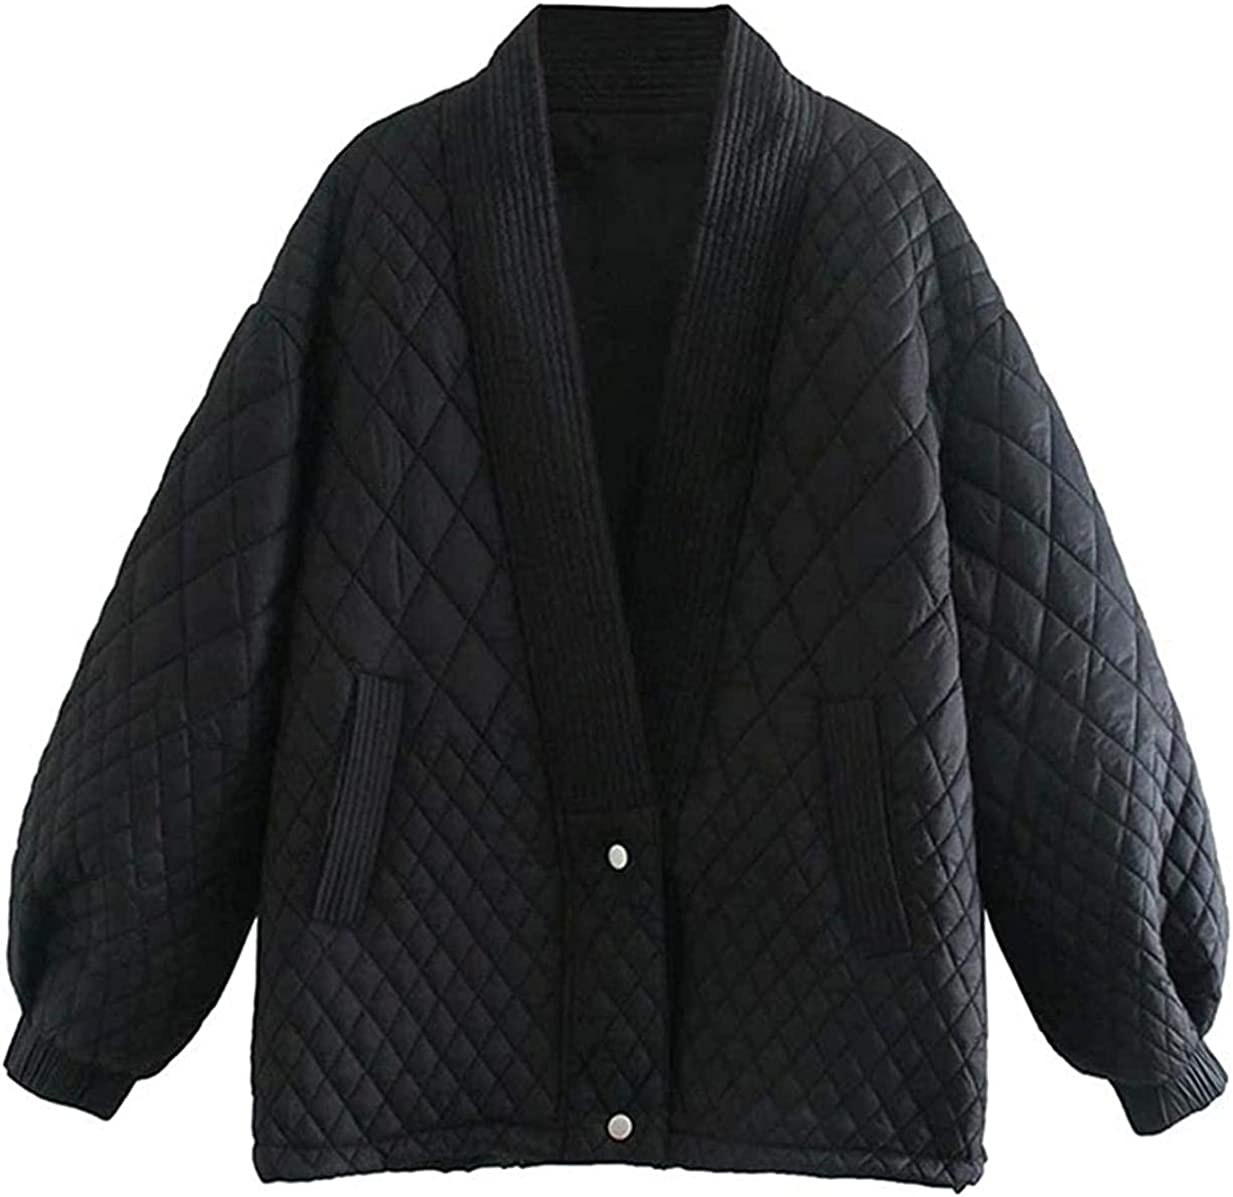 choutatou Women's Winter Oversized Diamond Cotton Quilted V Neck Coat Jacket